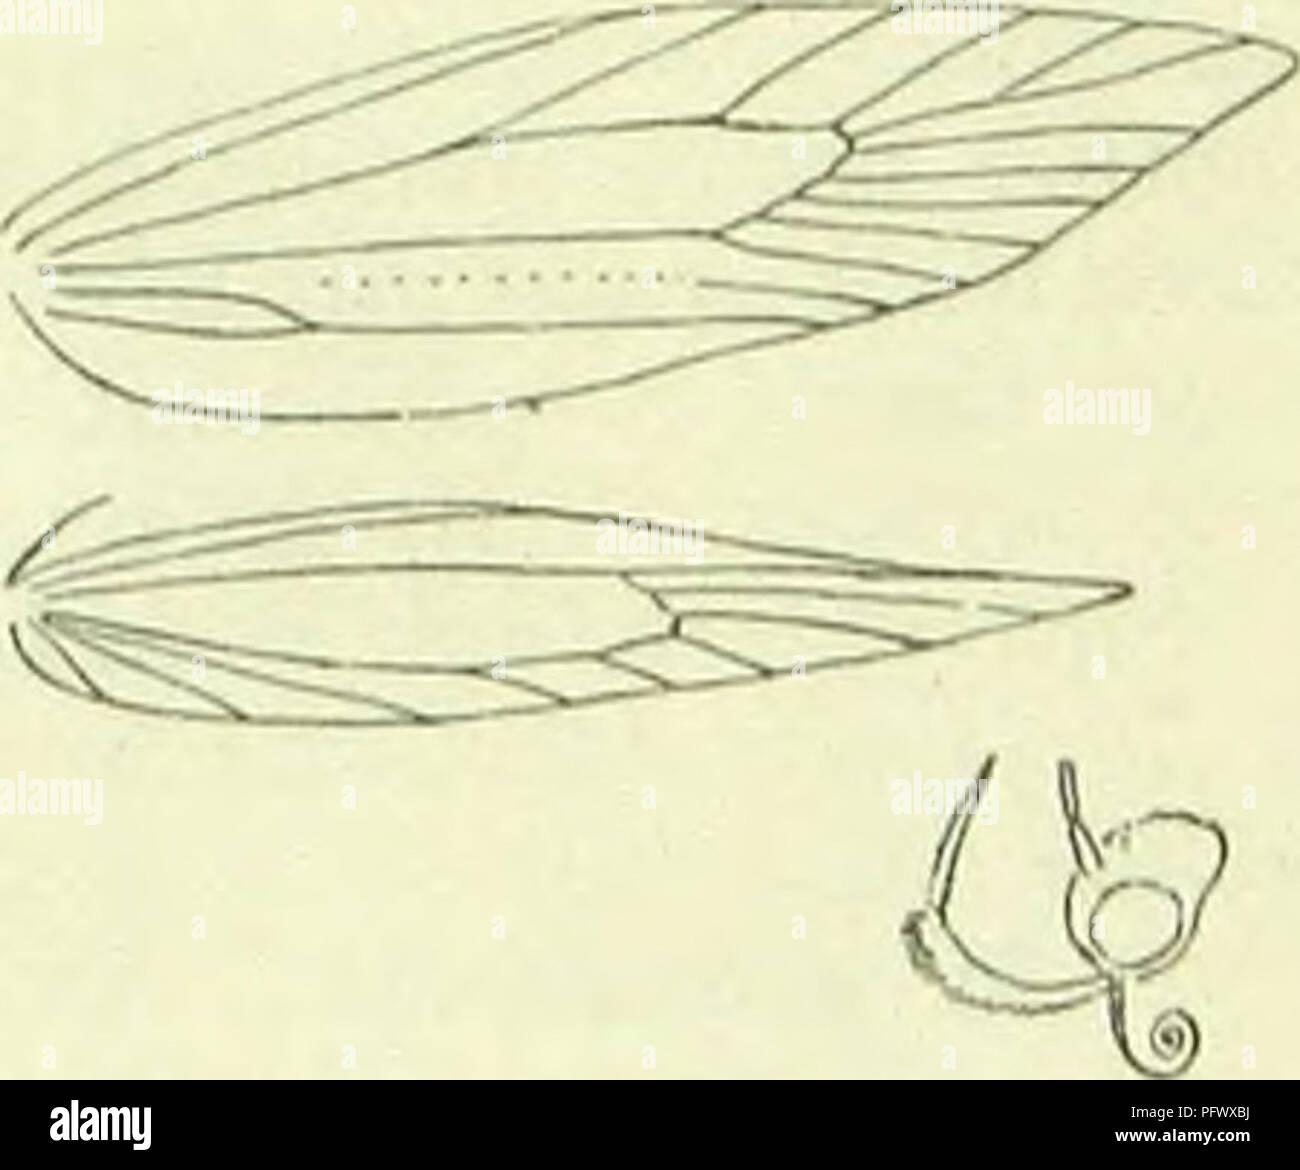 ". A handbook of British lepidoptera. Lepidoptera. MOMl'HAl KLAC11I.ST1DAK 079 4. 3. raschkiella. 5. G. 9. fulvescens. 10. nchraceella. I'J. Stephensi. 7. 1. Head metallic! "" not metallic 2. Stigmata distinct, silver-metallic , L. termmella. "" not distinct .... 3. 3. Korewings with metallic dorsal mark before tonms 2. schrankella. "" without such mark 4. Forewings ochreous or yellow "" not OchreOUS or yellow 5. Hindwings dark grey "" whitish-yellowish G. Forewings white . ,, dark fuscous or grey . 7. Head whitish-oehreous or ochreous-white . ,, grey or dark fuscous on crown . 9. 8. Thorax and basa - Stock Image"